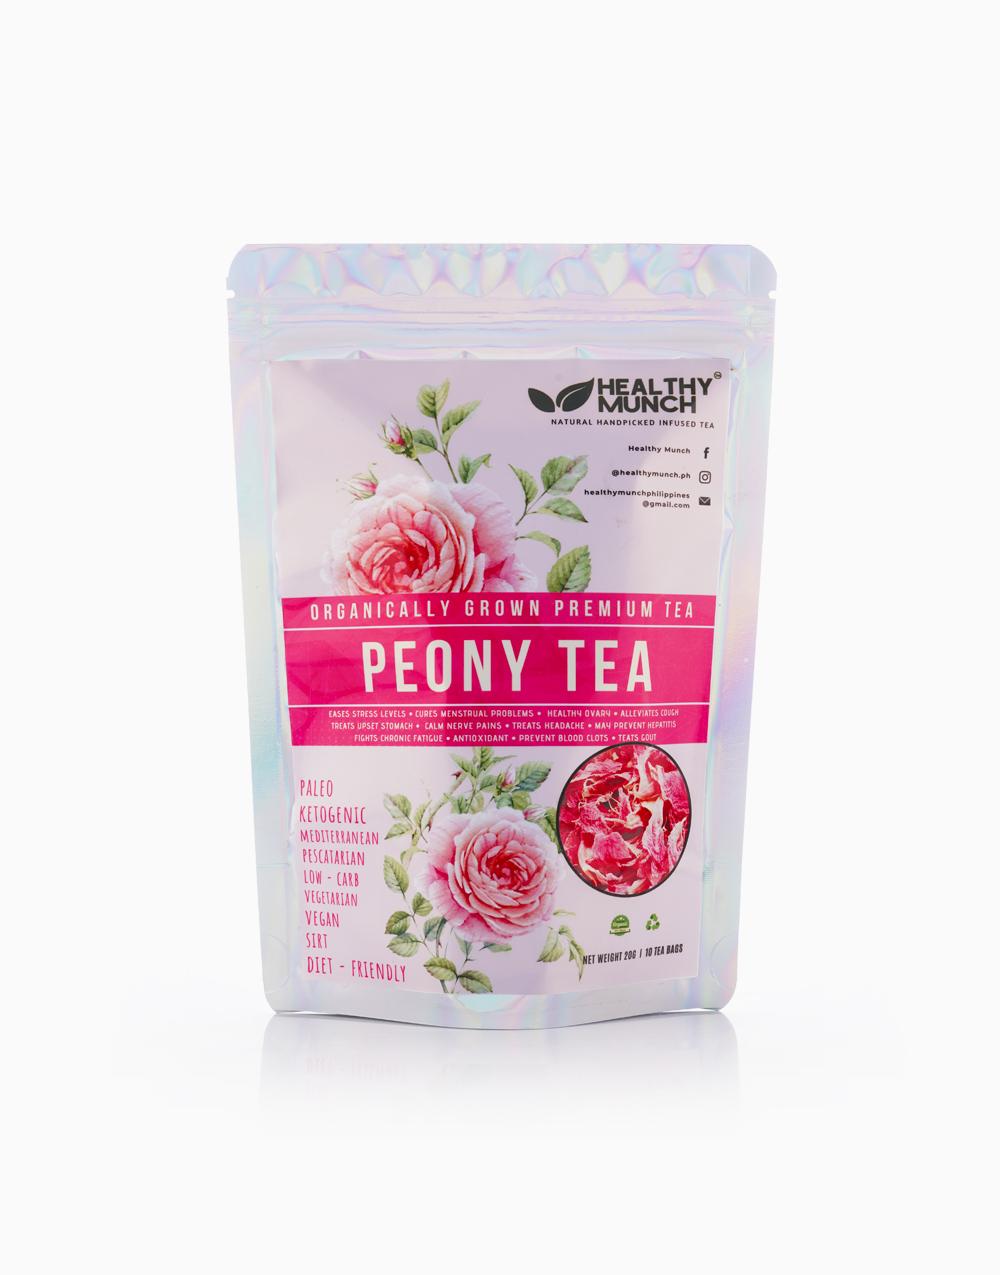 Peony Tea (20g) by Healthy Munch